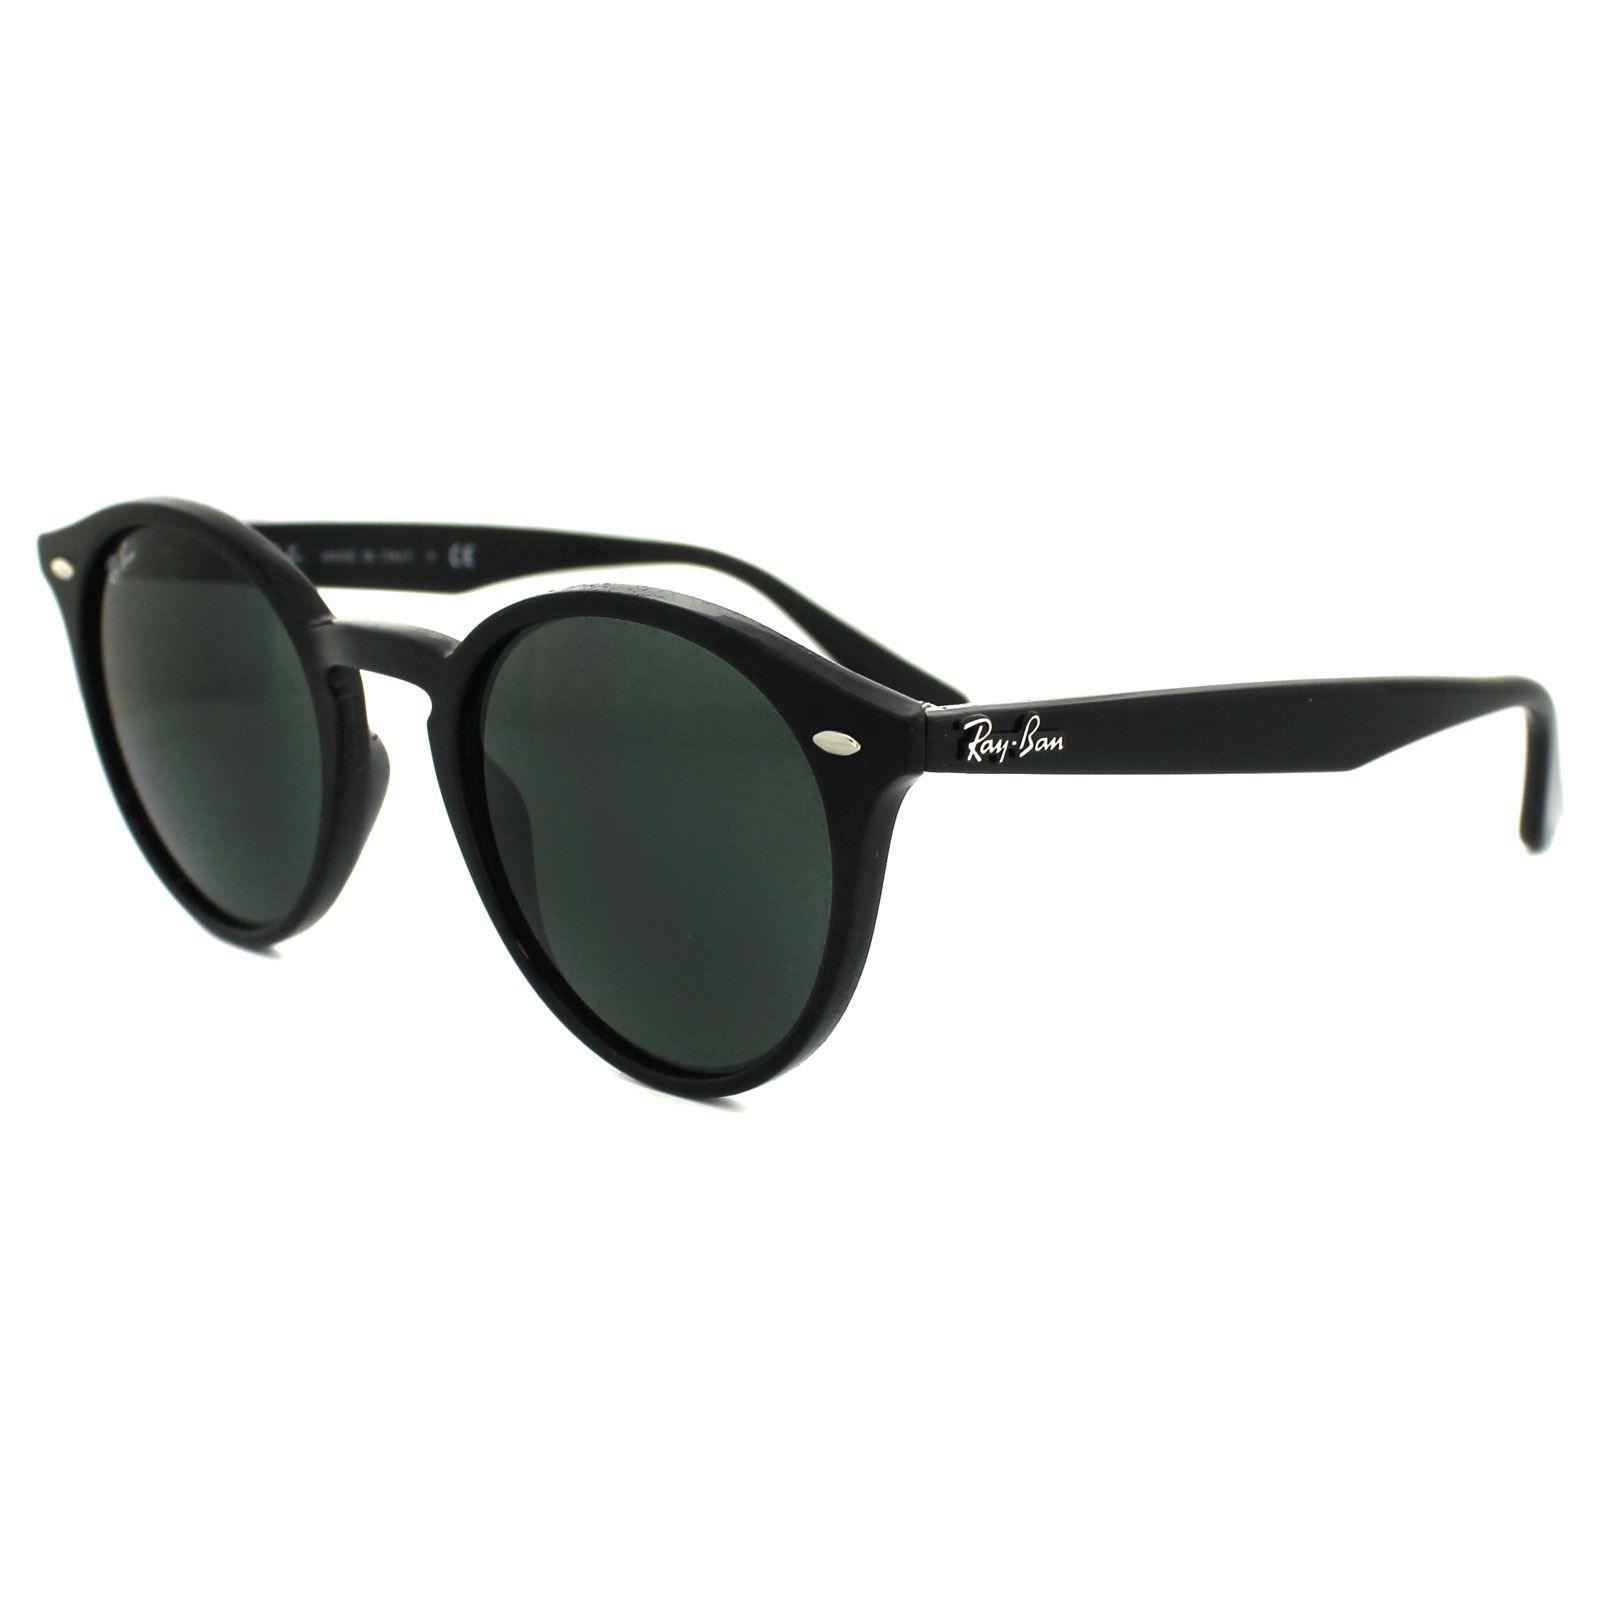 Ray-Ban Sunglasses 2180 601/71 Black Green